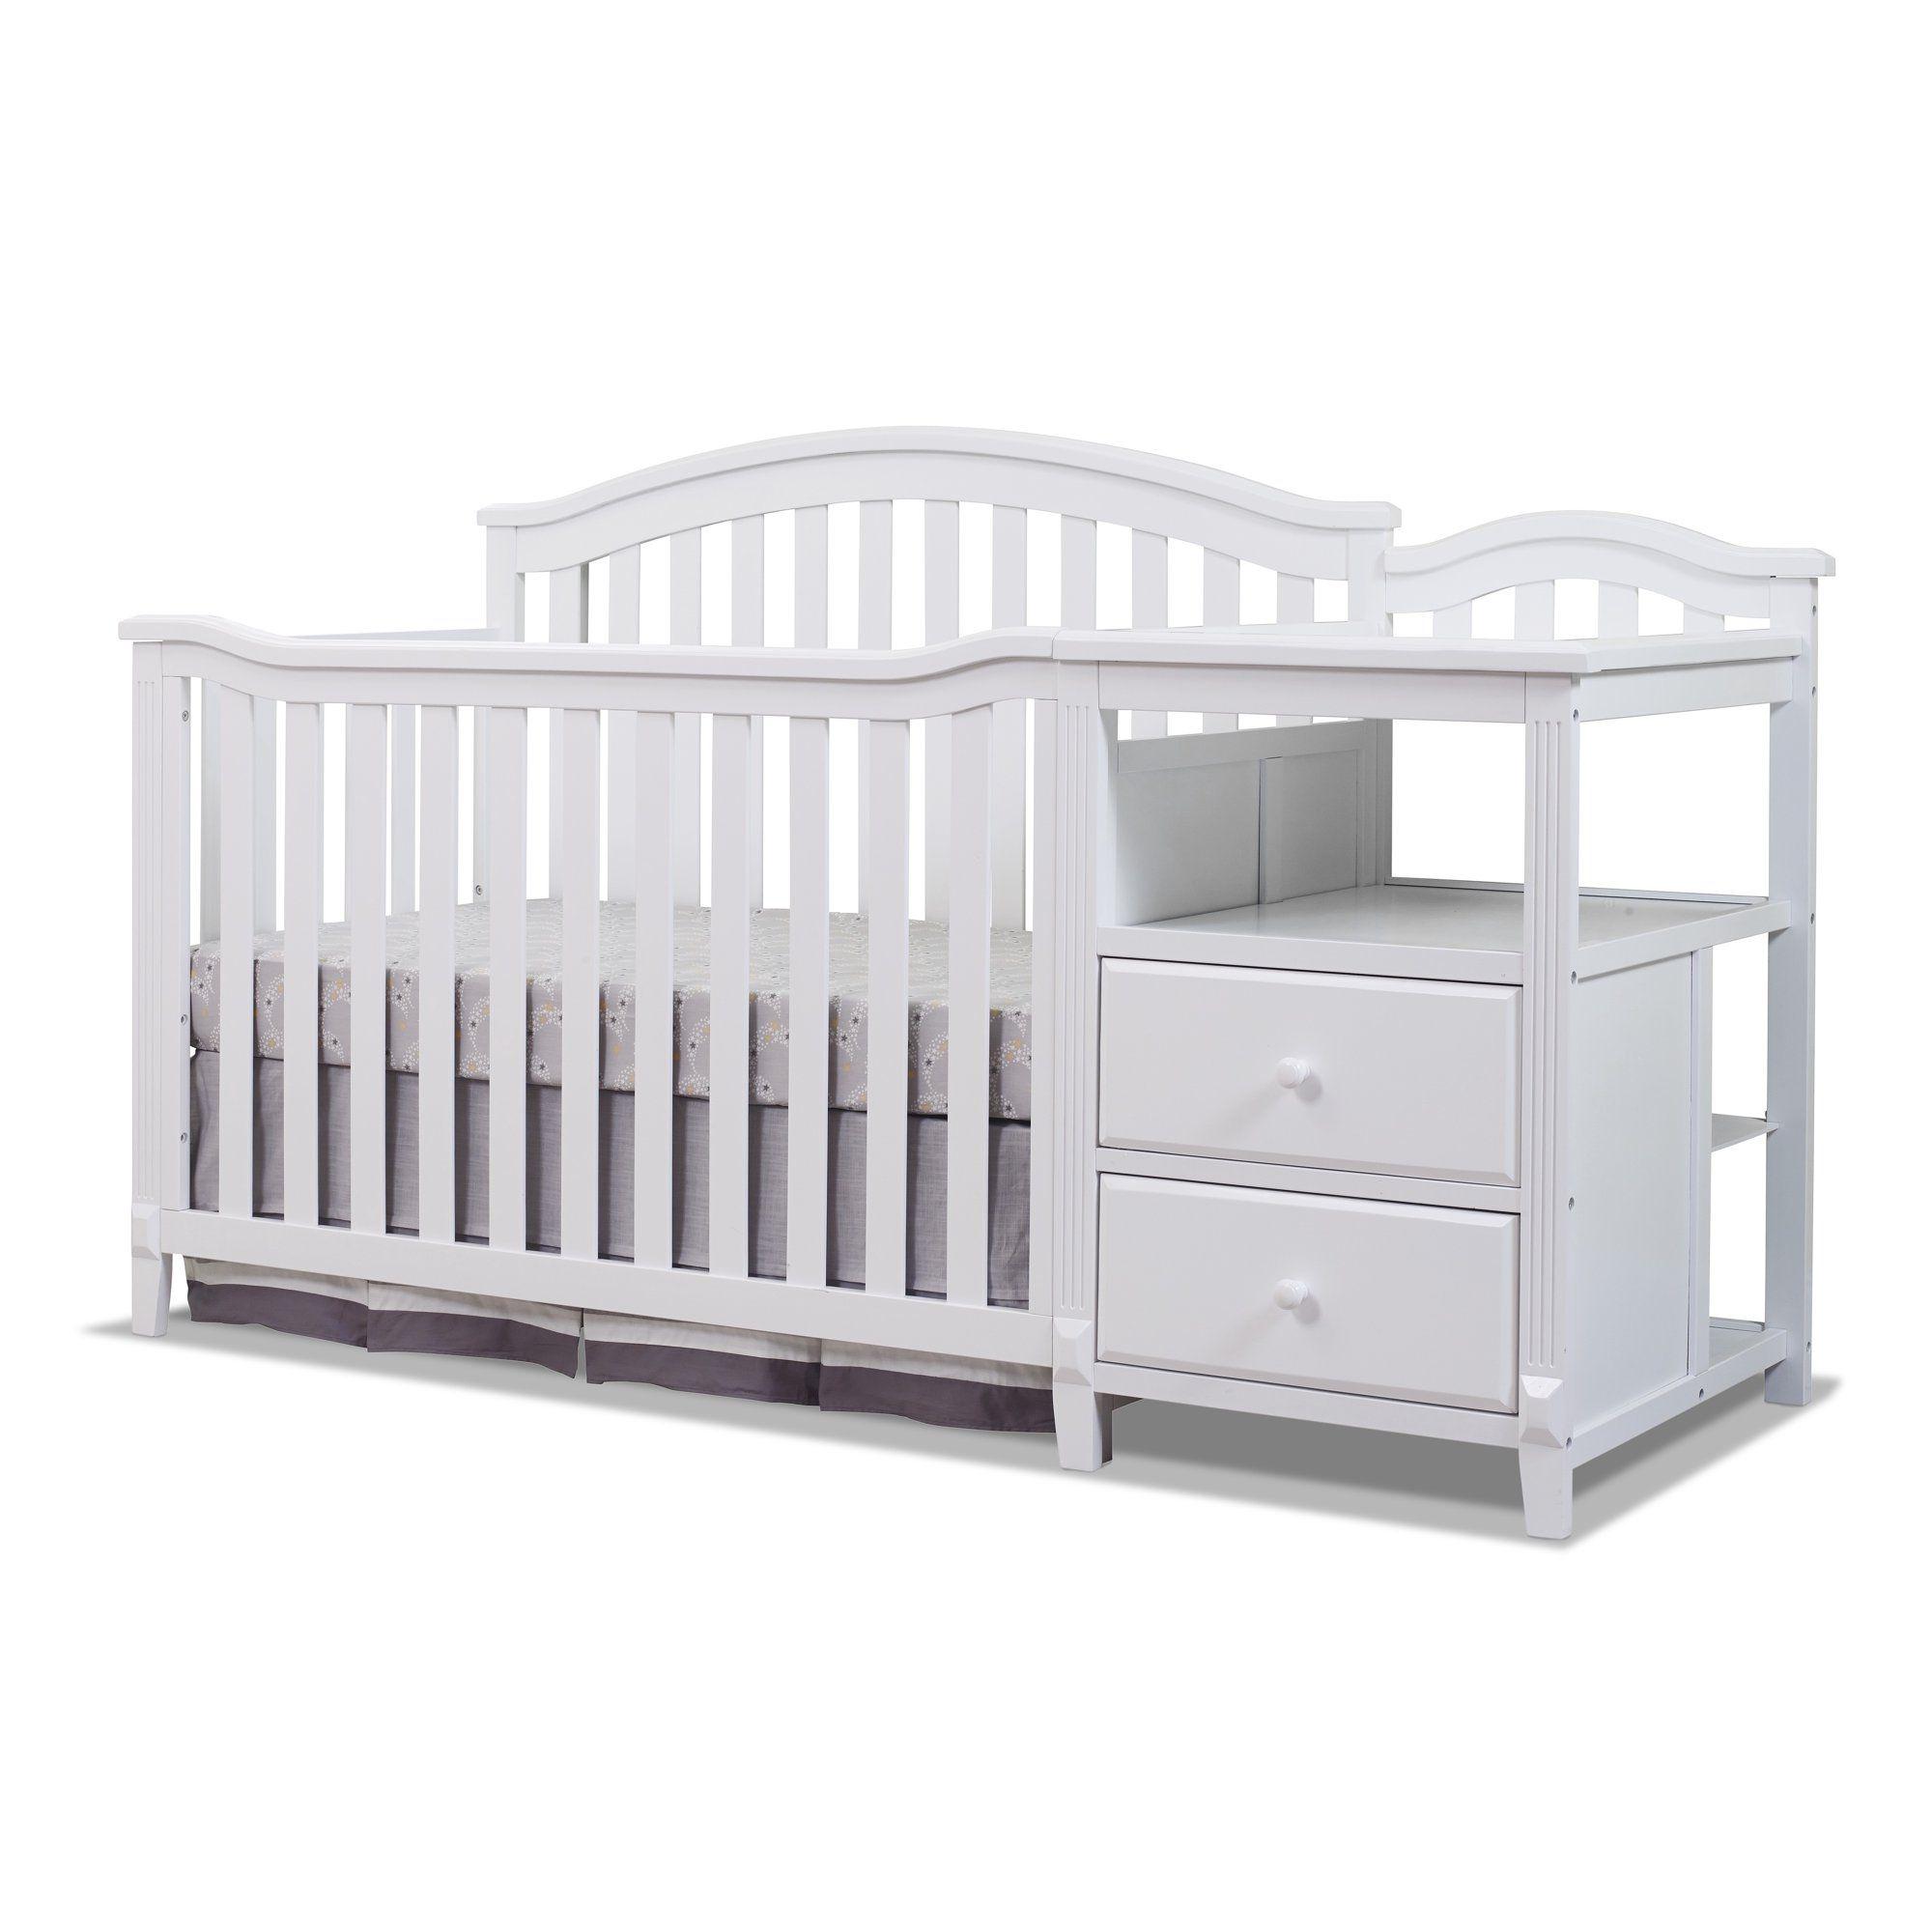 Sorelle Furniture Berkley 4 In 1 Convertible Crib And Changer Gray Walmart Com In 2021 Luxury Baby Crib Crib And Changing Table Combo Convertible Crib Cribs with changing table combo